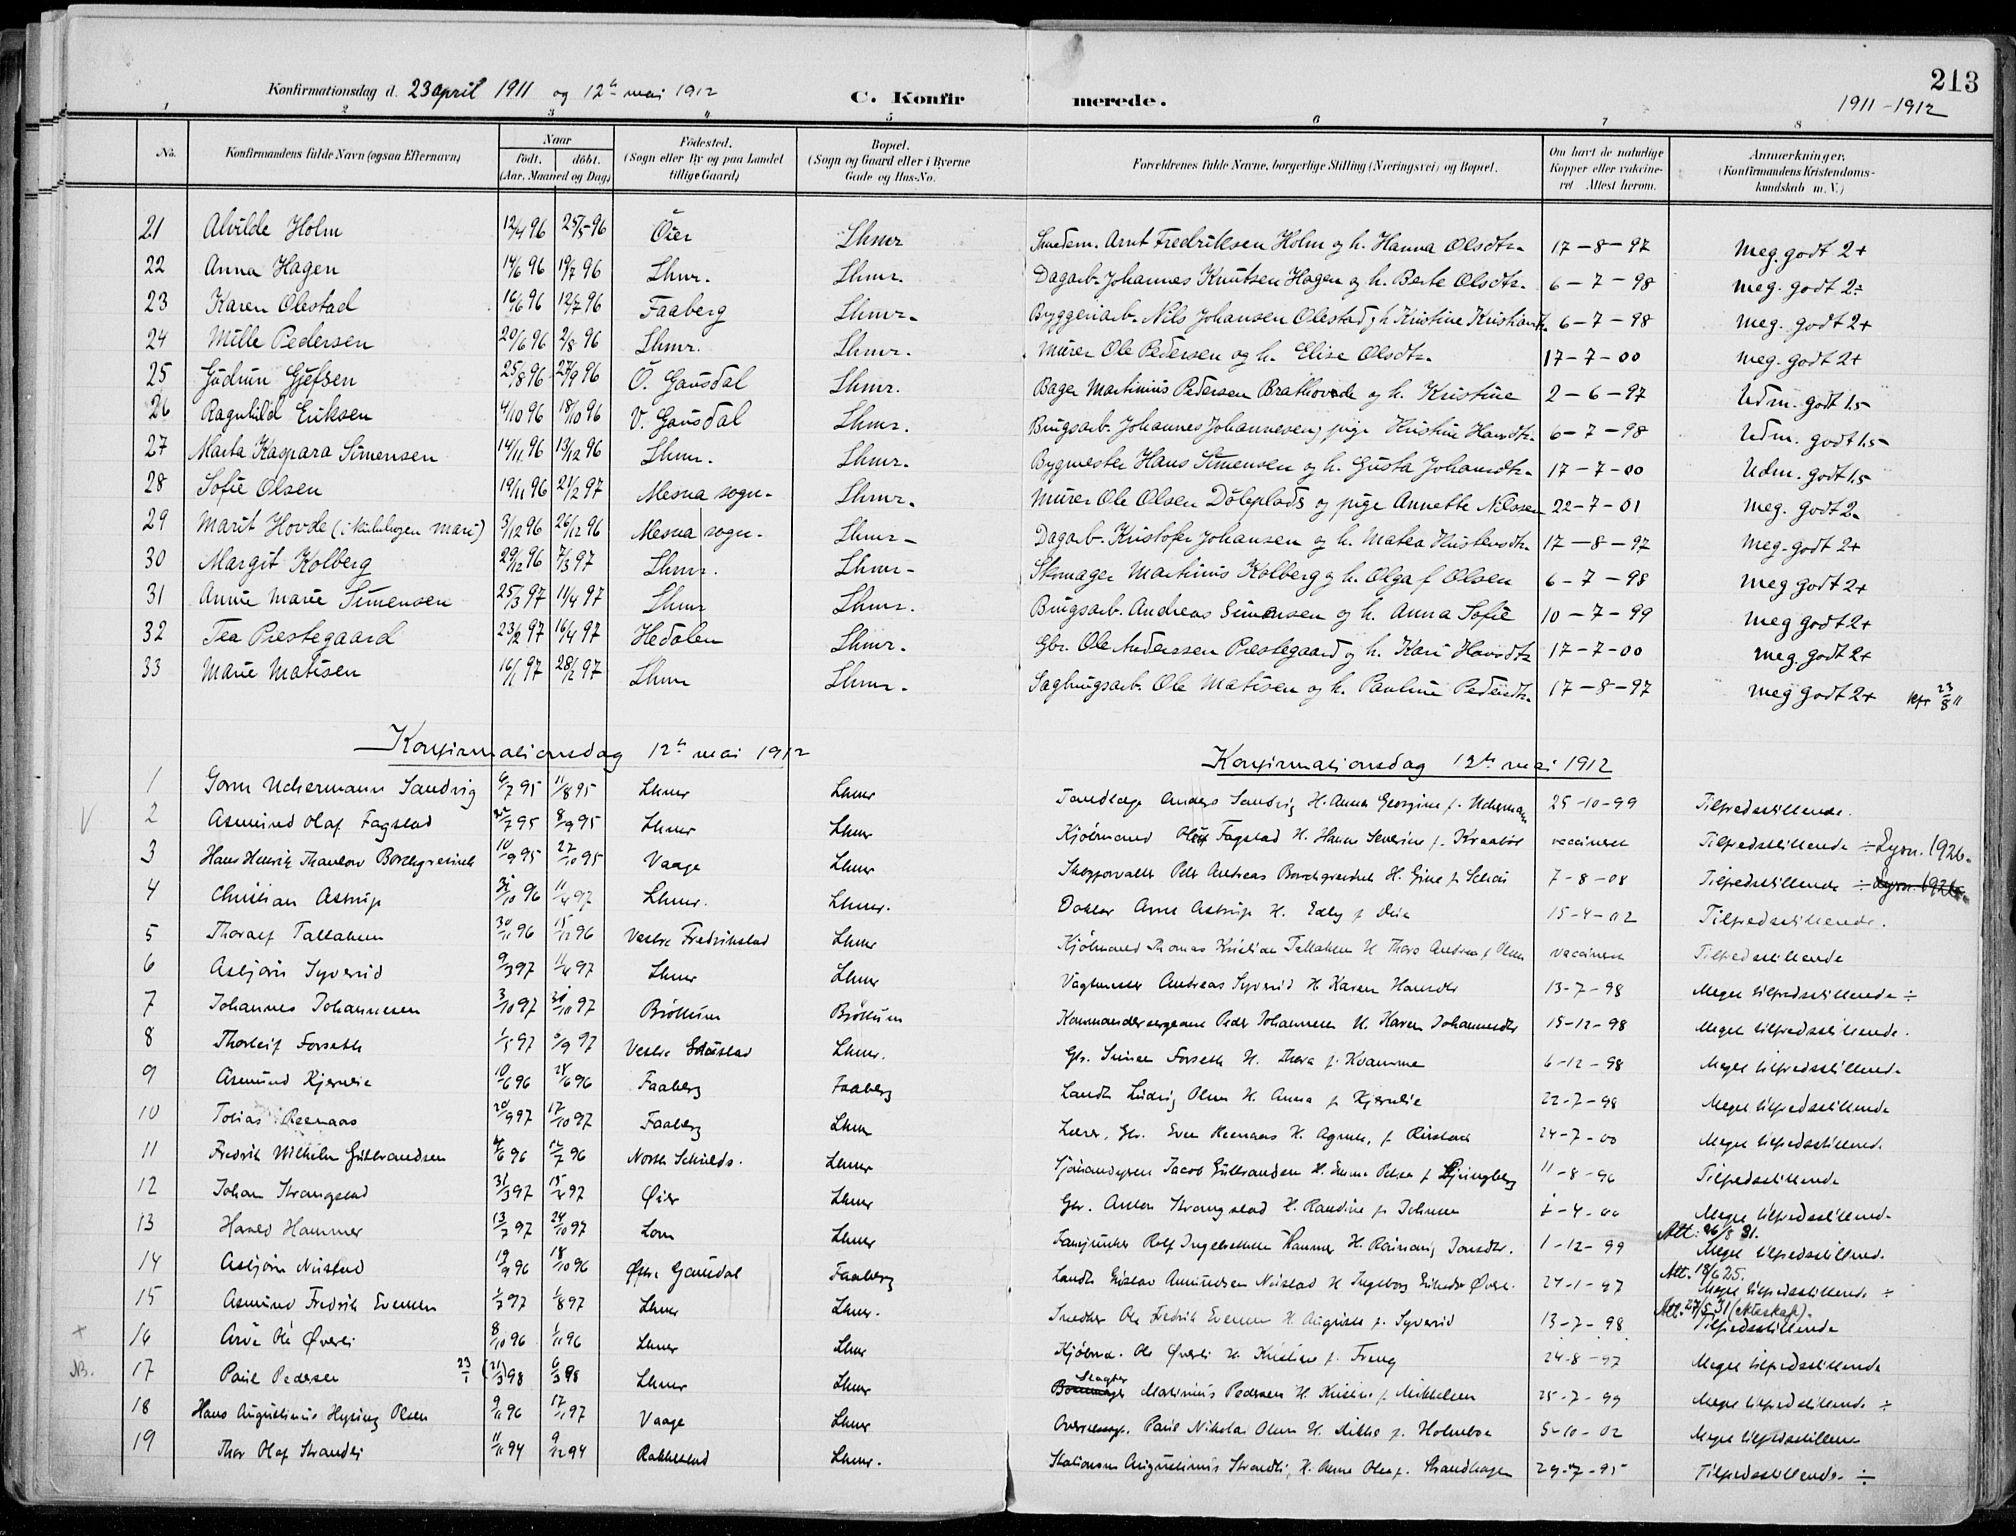 SAH, Lillehammer prestekontor, Ministerialbok nr. 1, 1901-1916, s. 213